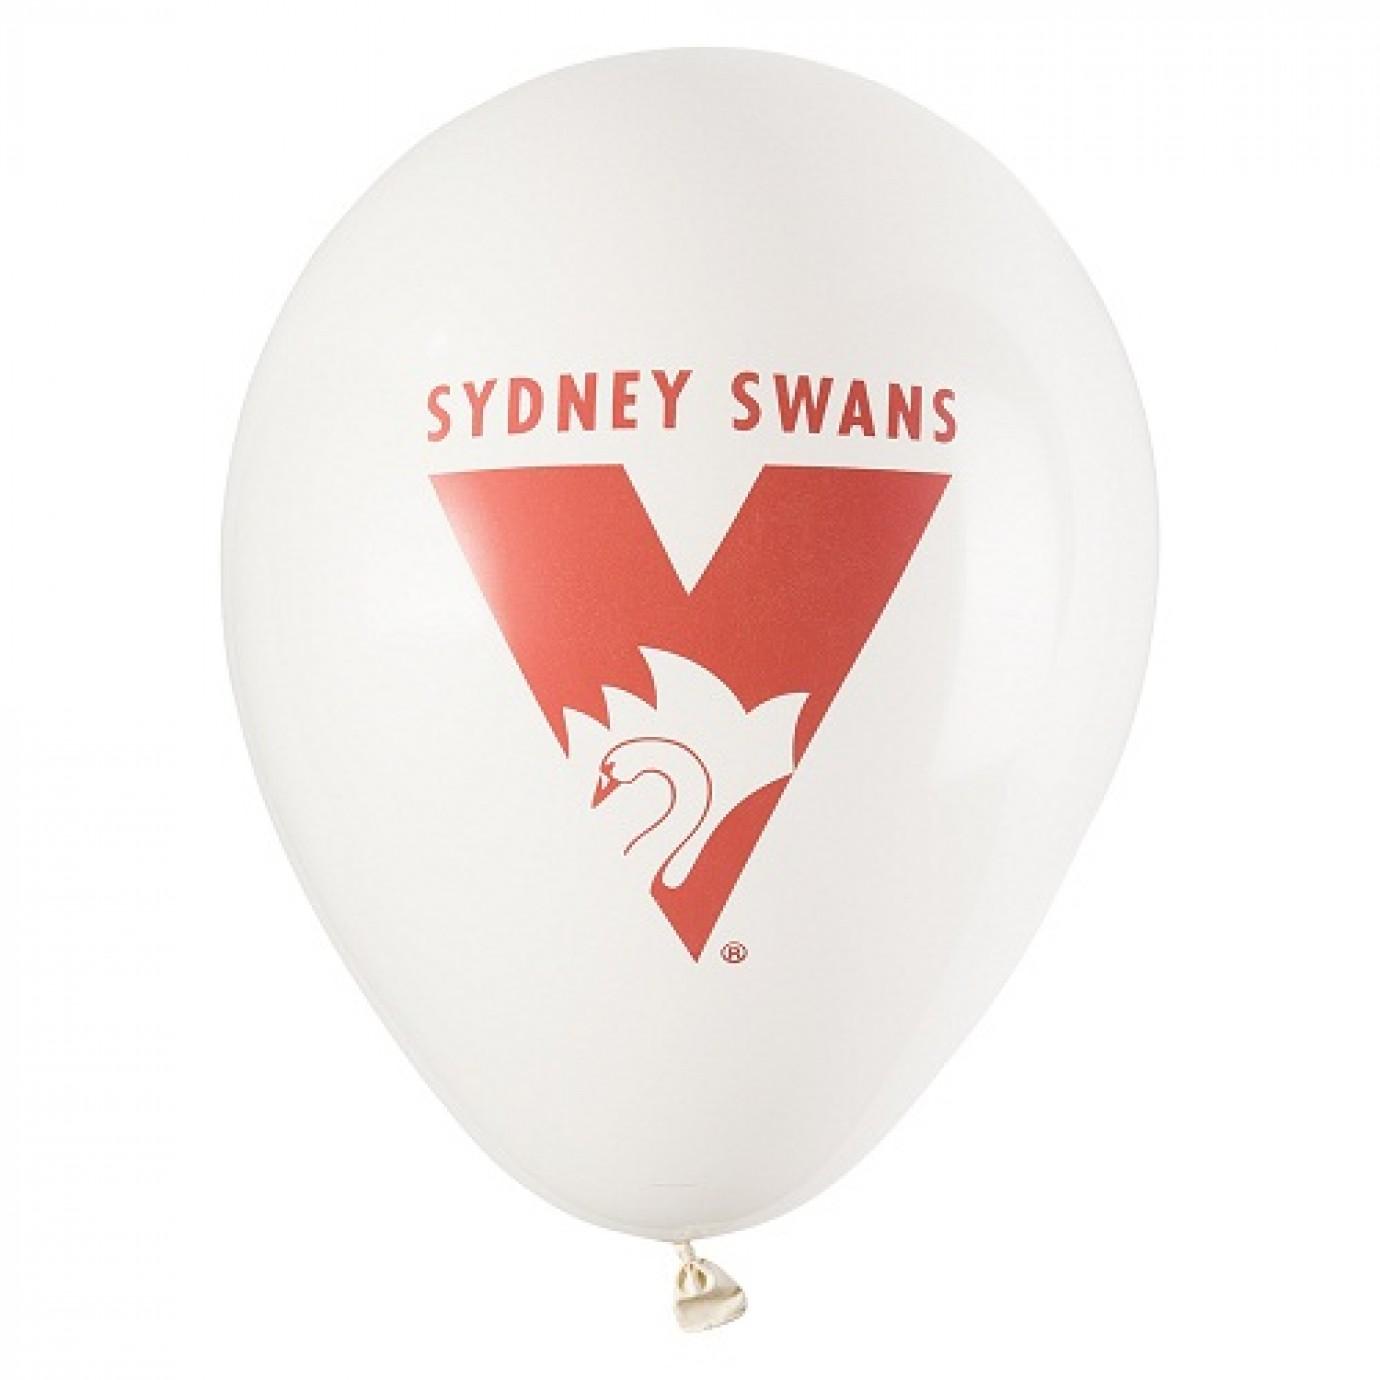 sydney swans - photo #21